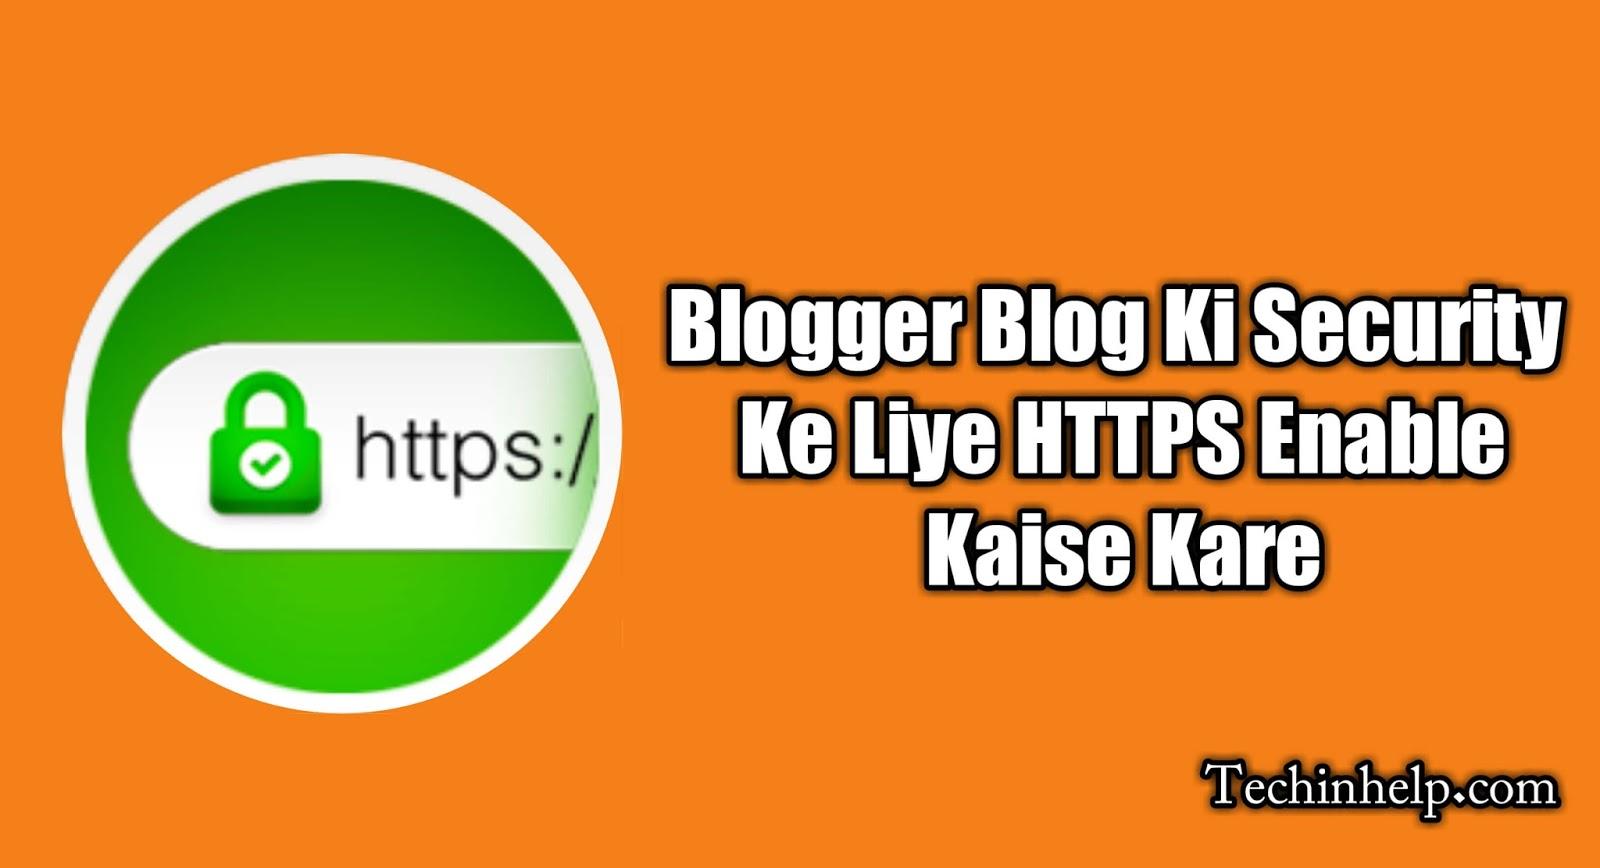 Blogger Blog Ki Security Ke Liye HTTPS Enable Kaise Kare